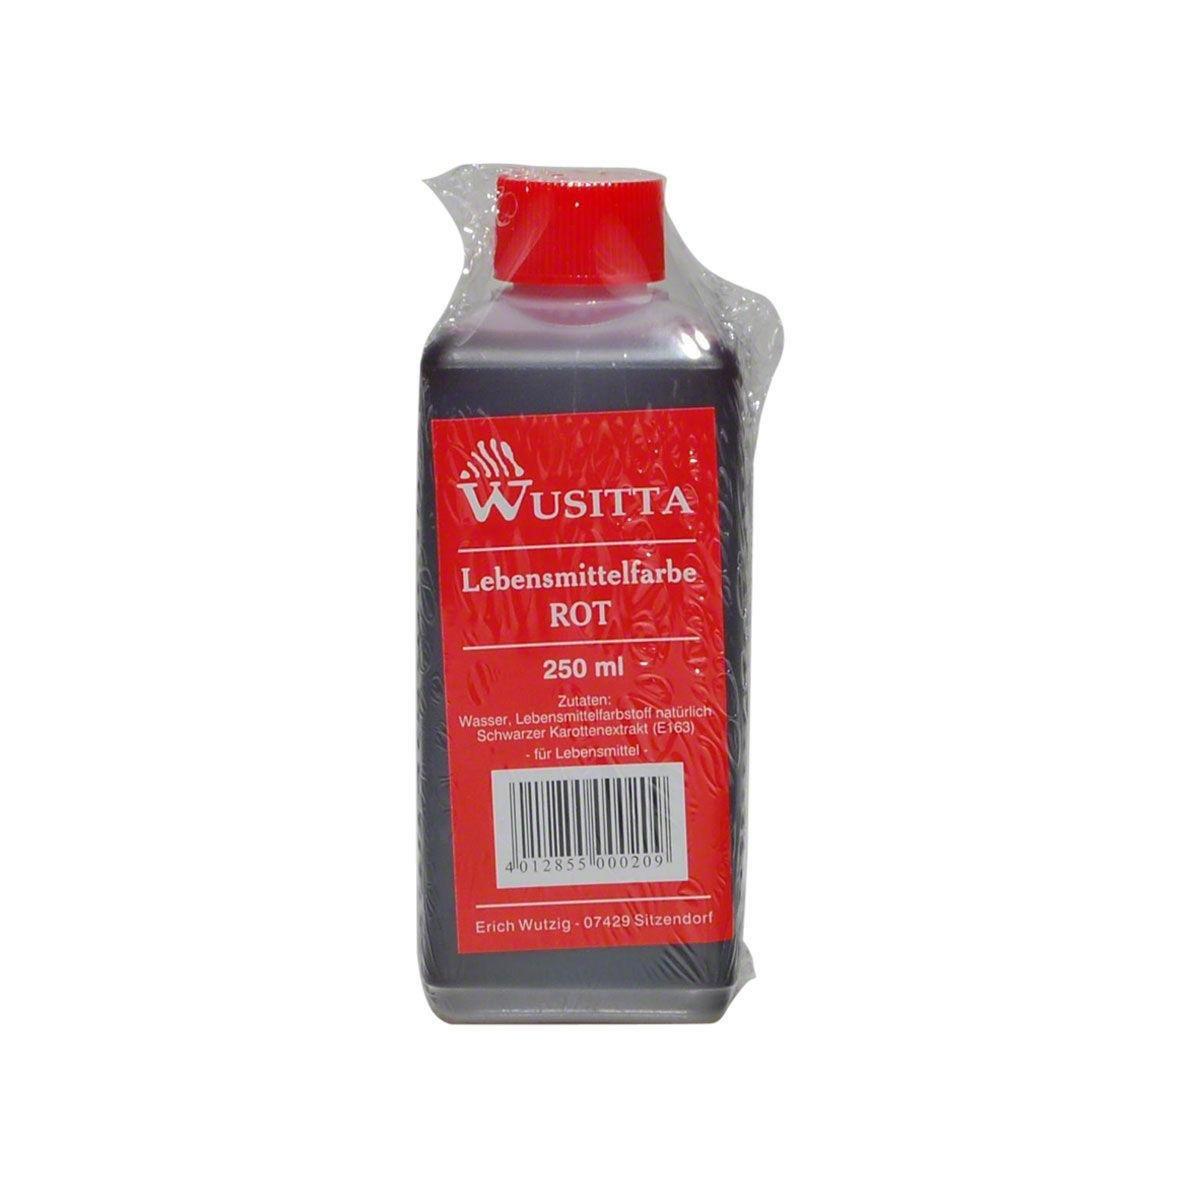 Amazon.com : Wusitta Lebensmittelfarbe rot - 1 x 250 ml : Grocery & Gourmet Food